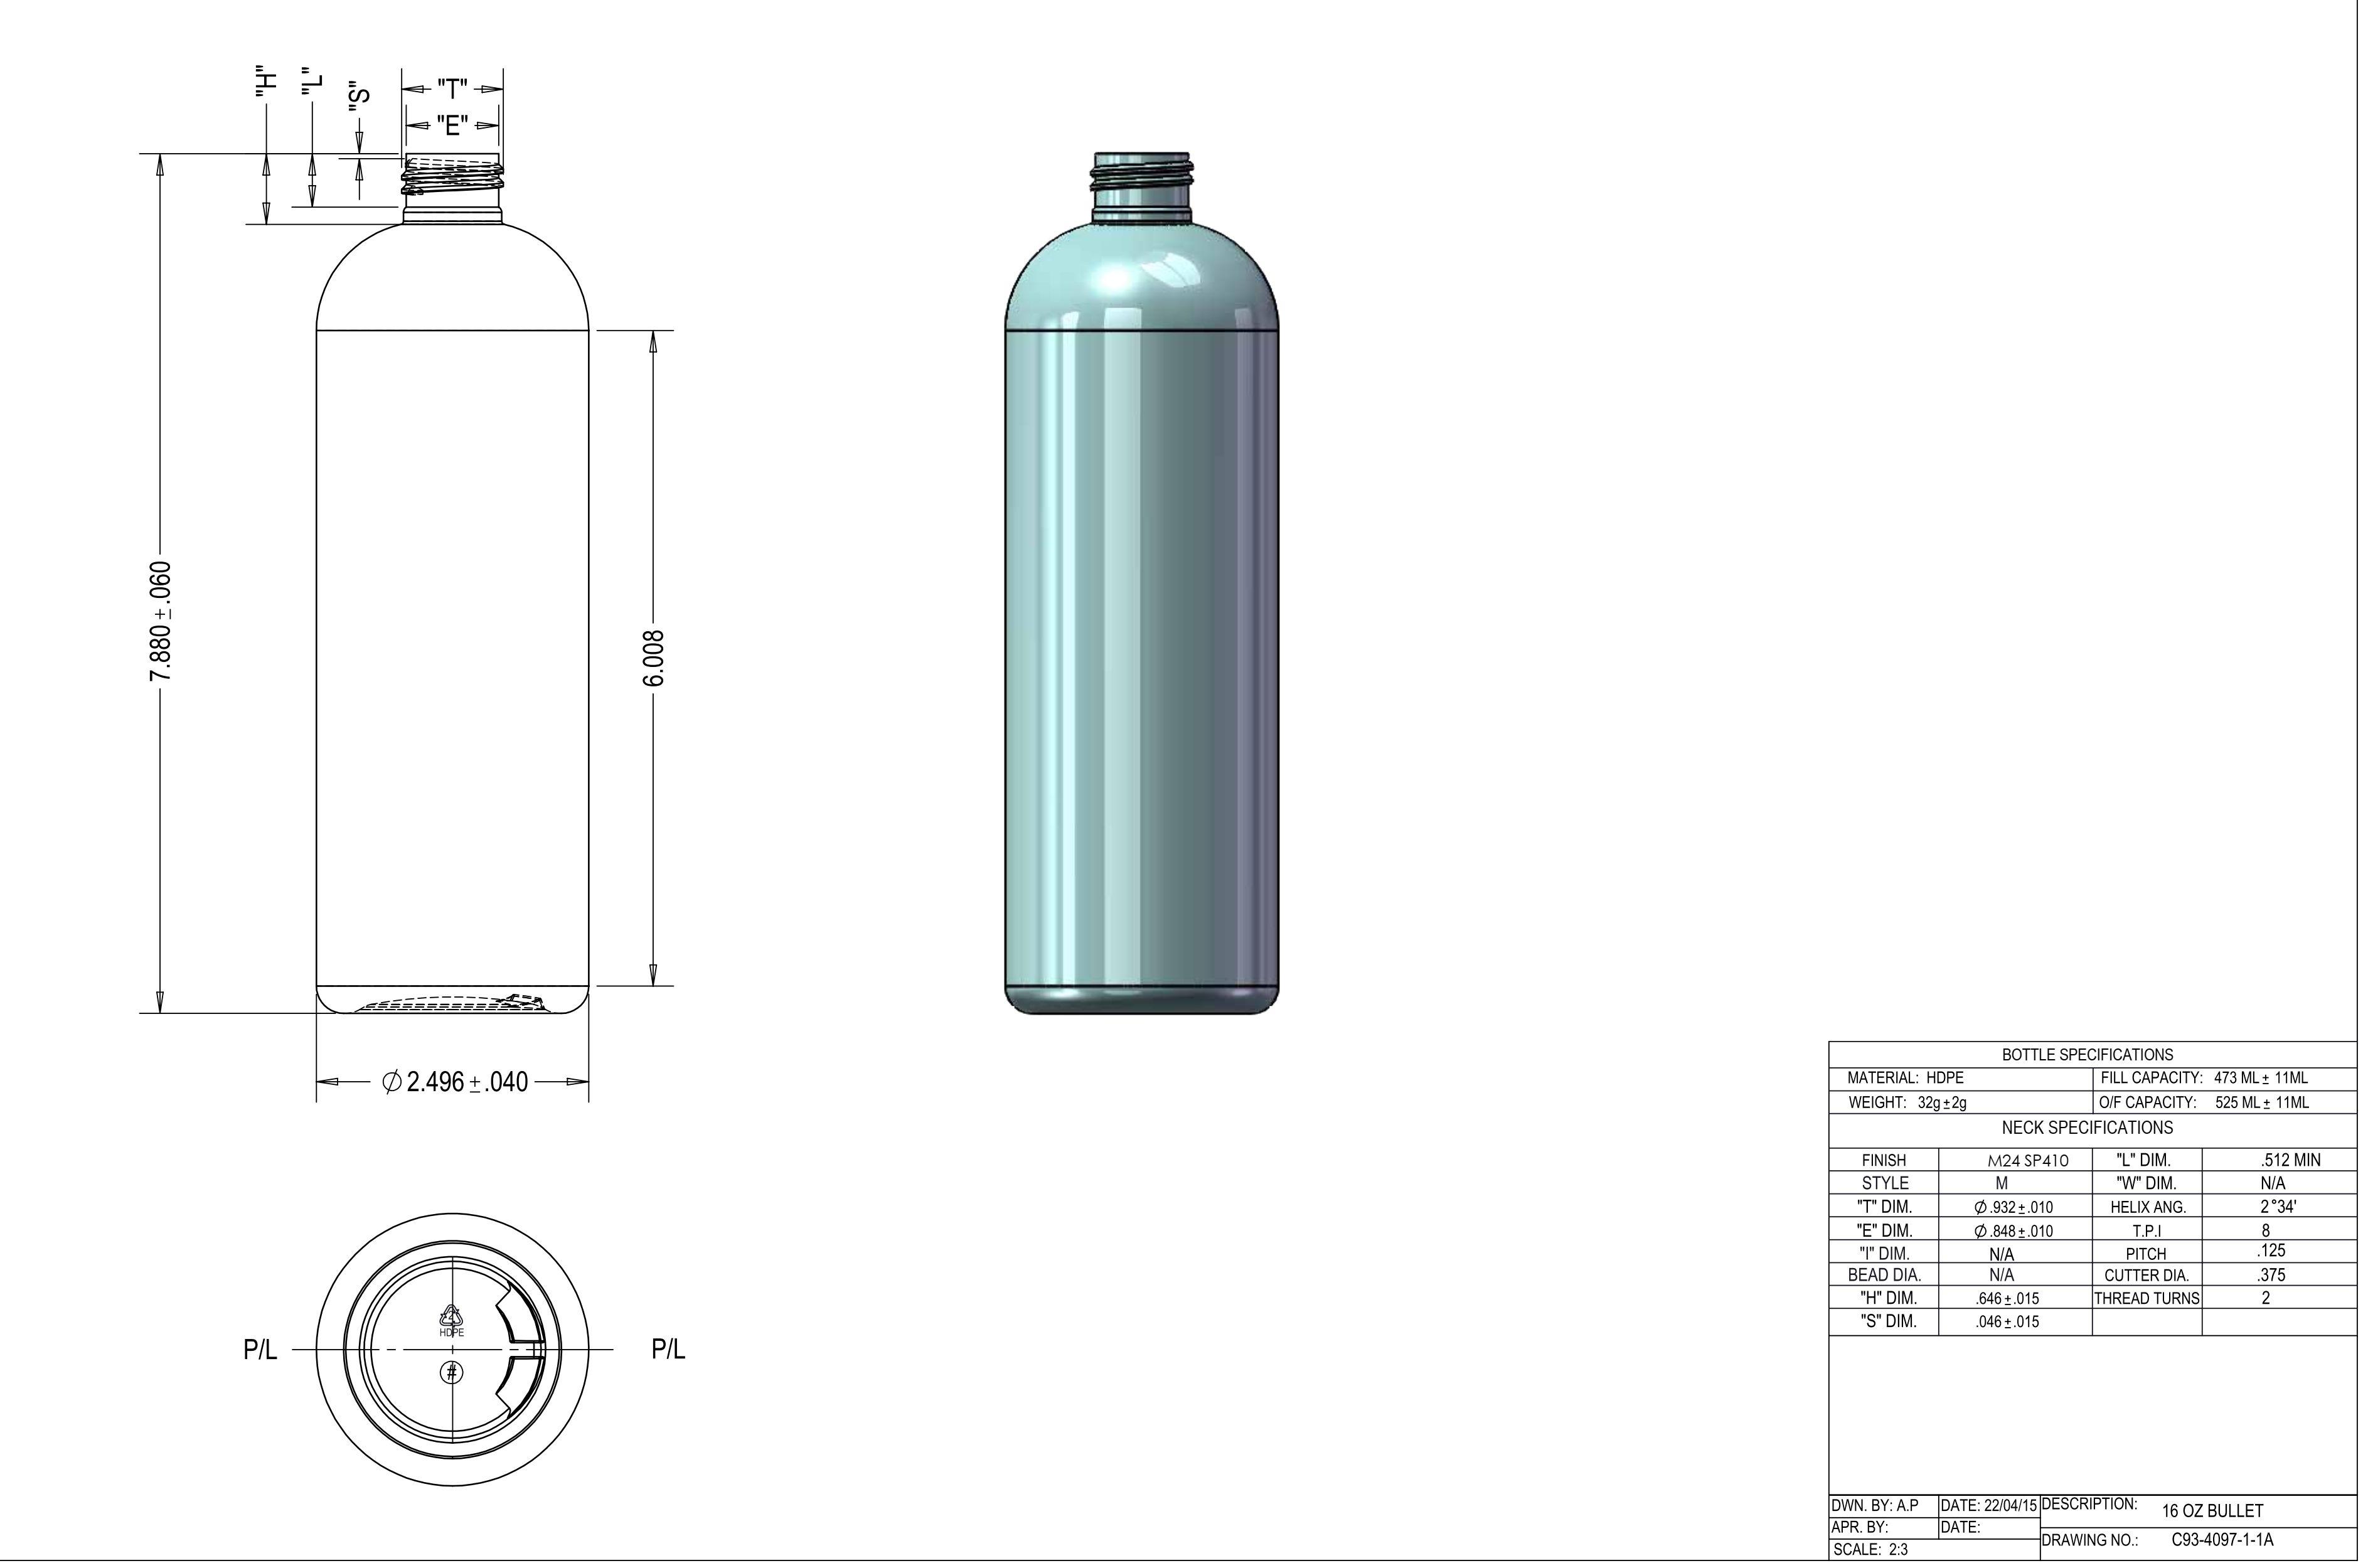 25,000 HDPE Bottles, NATURAL, NEW, 24/410 Neck, 16oz Boston Round - Image 6 of 6